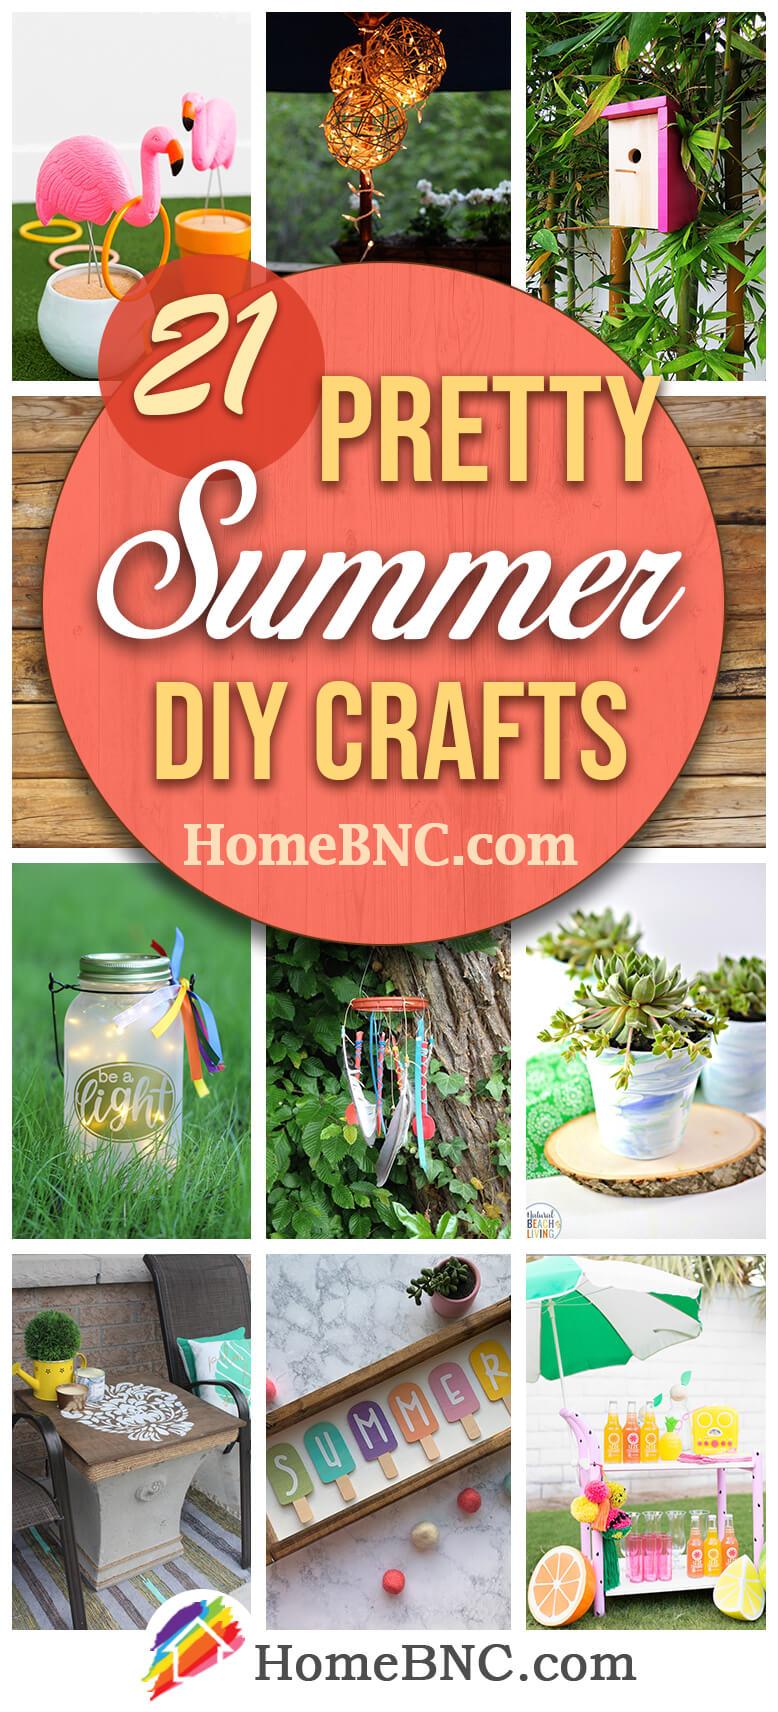 DIY Summer Crafts